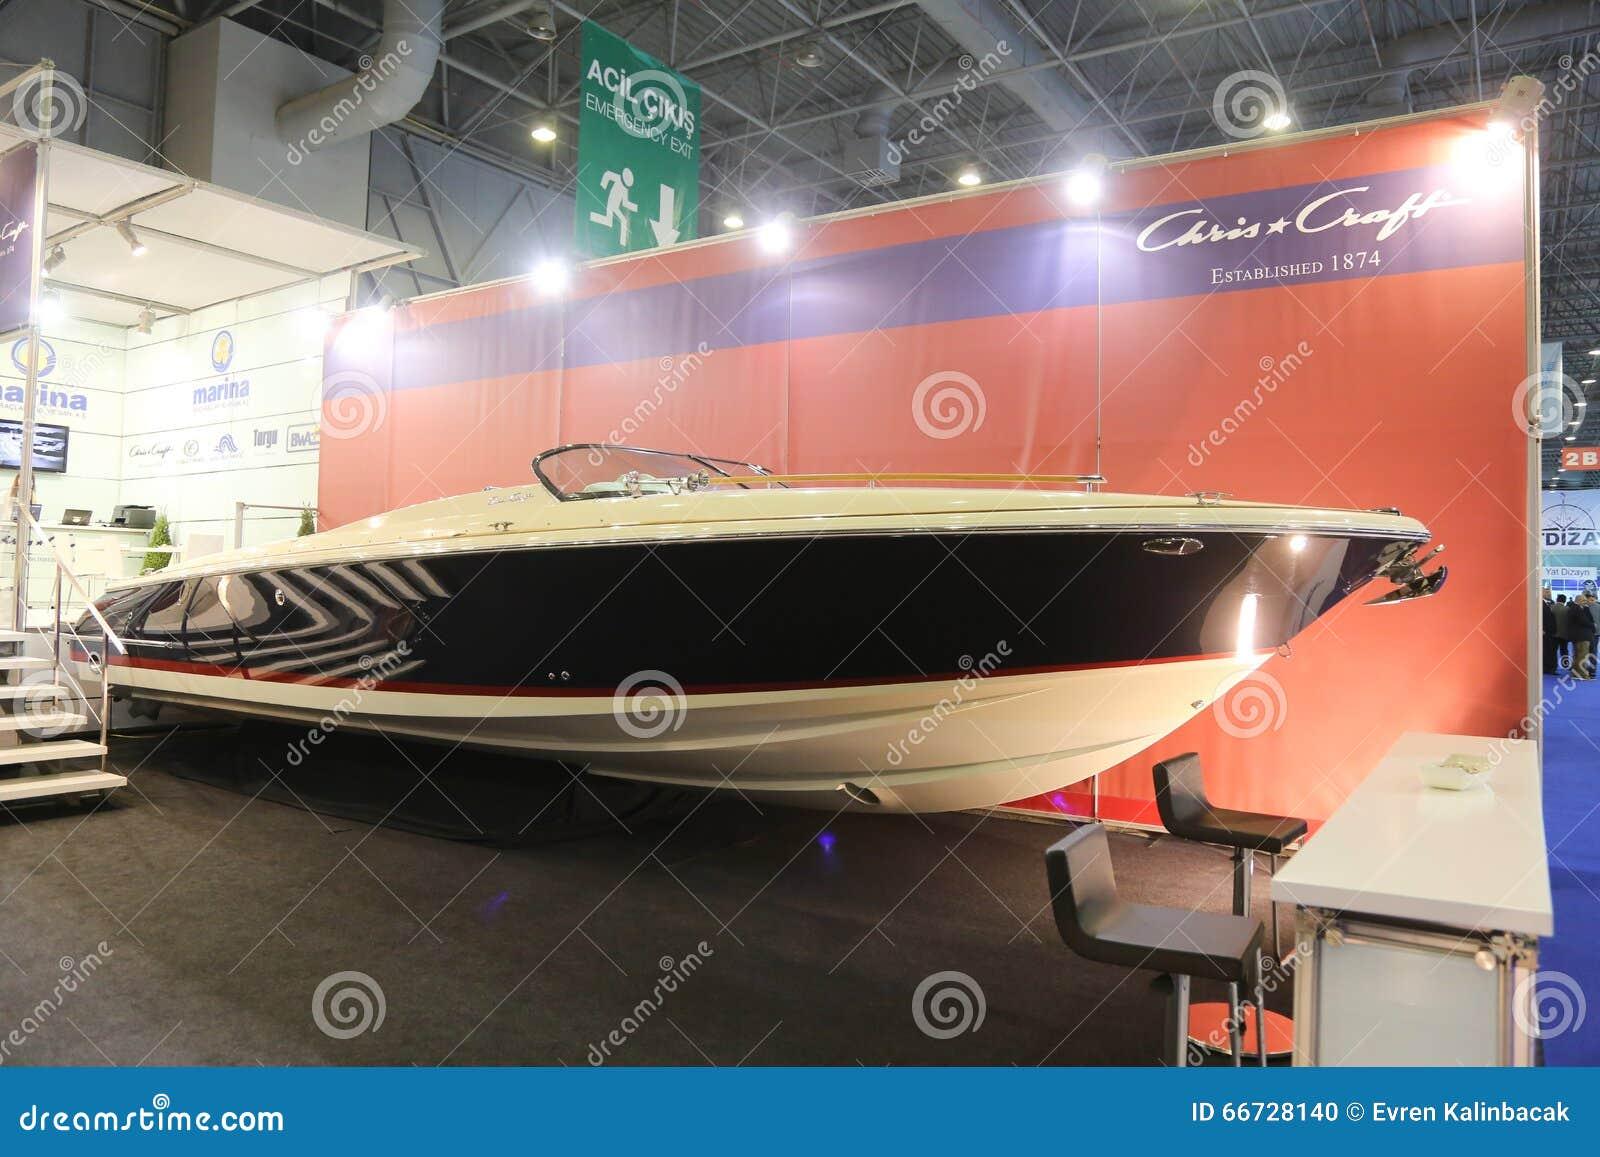 CNR欧亚大陆小船展示